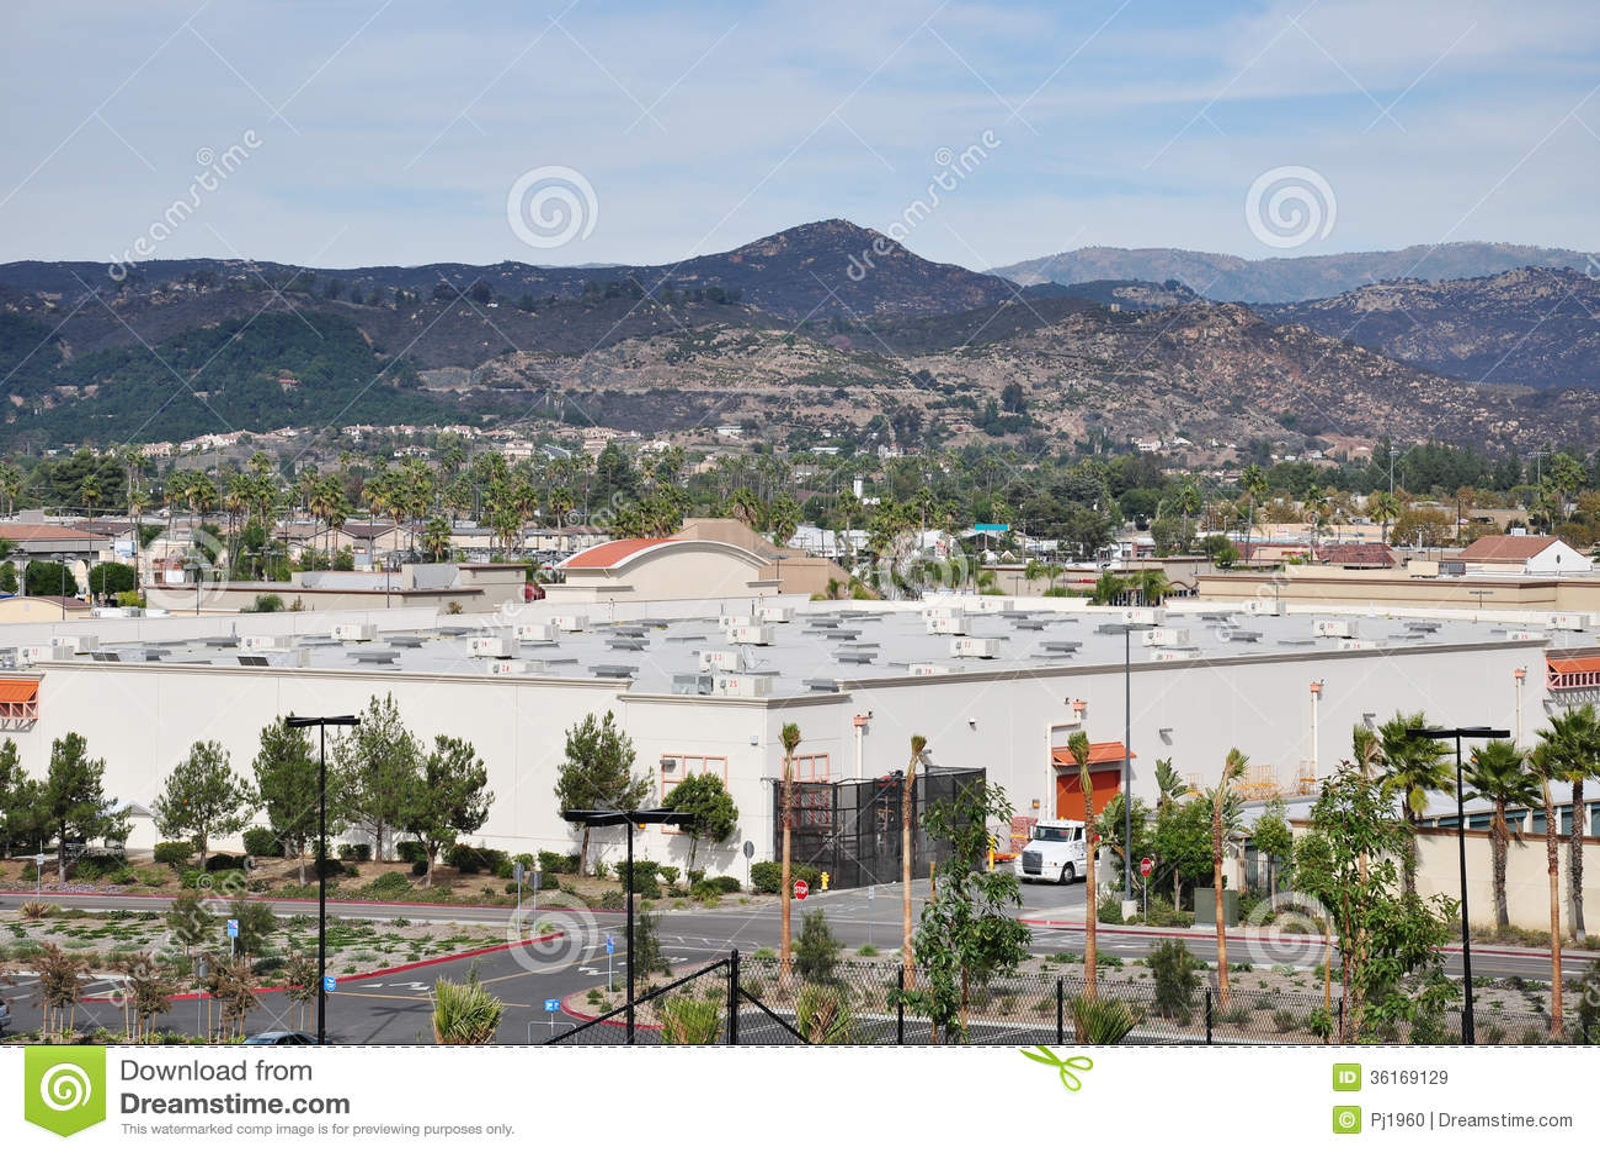 city escondido view commercial district california 36169129